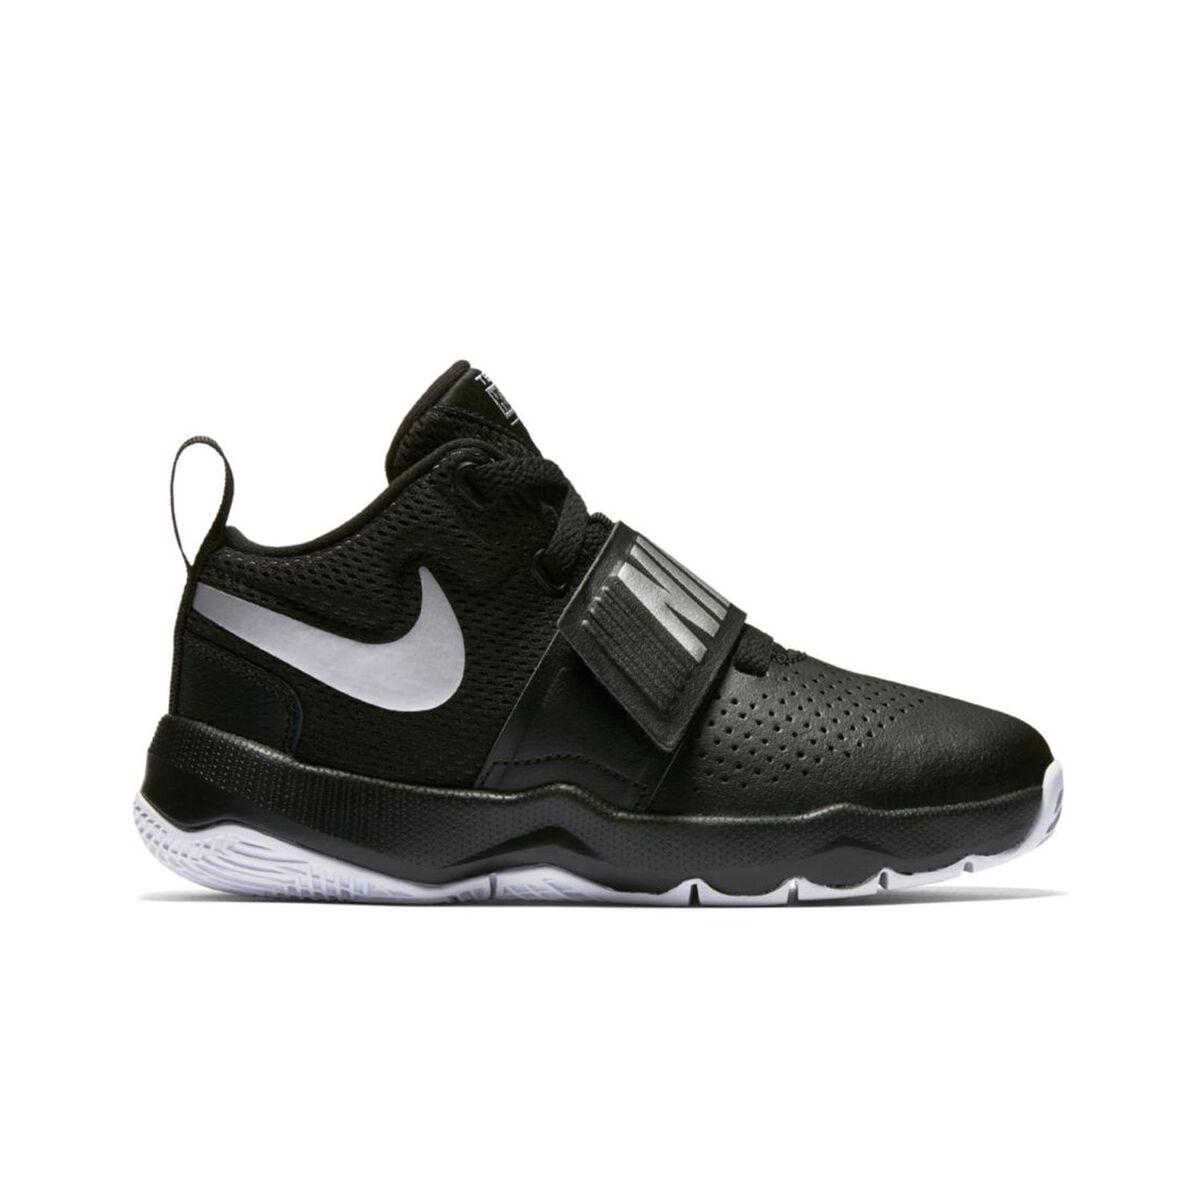 Nike team hustle d 8 bambino